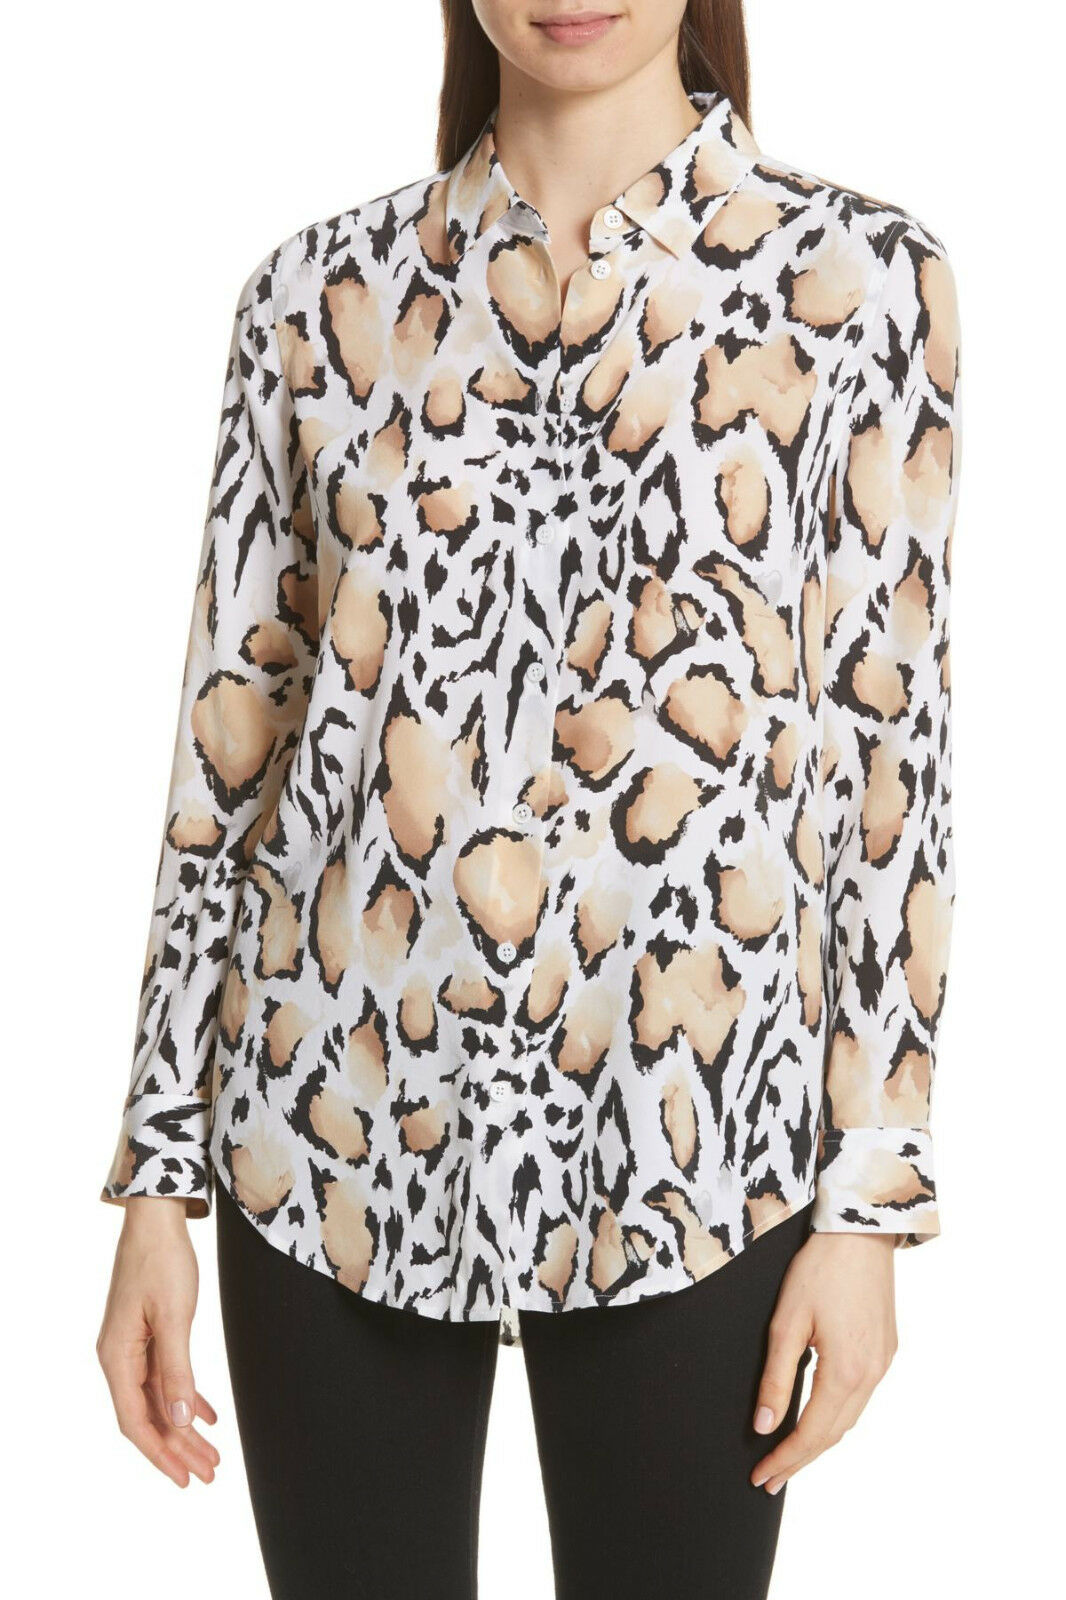 NWT  EQUIPMENT 'Essential' Leopard Animal Print Silk Blouse, Weiß  Multi, L